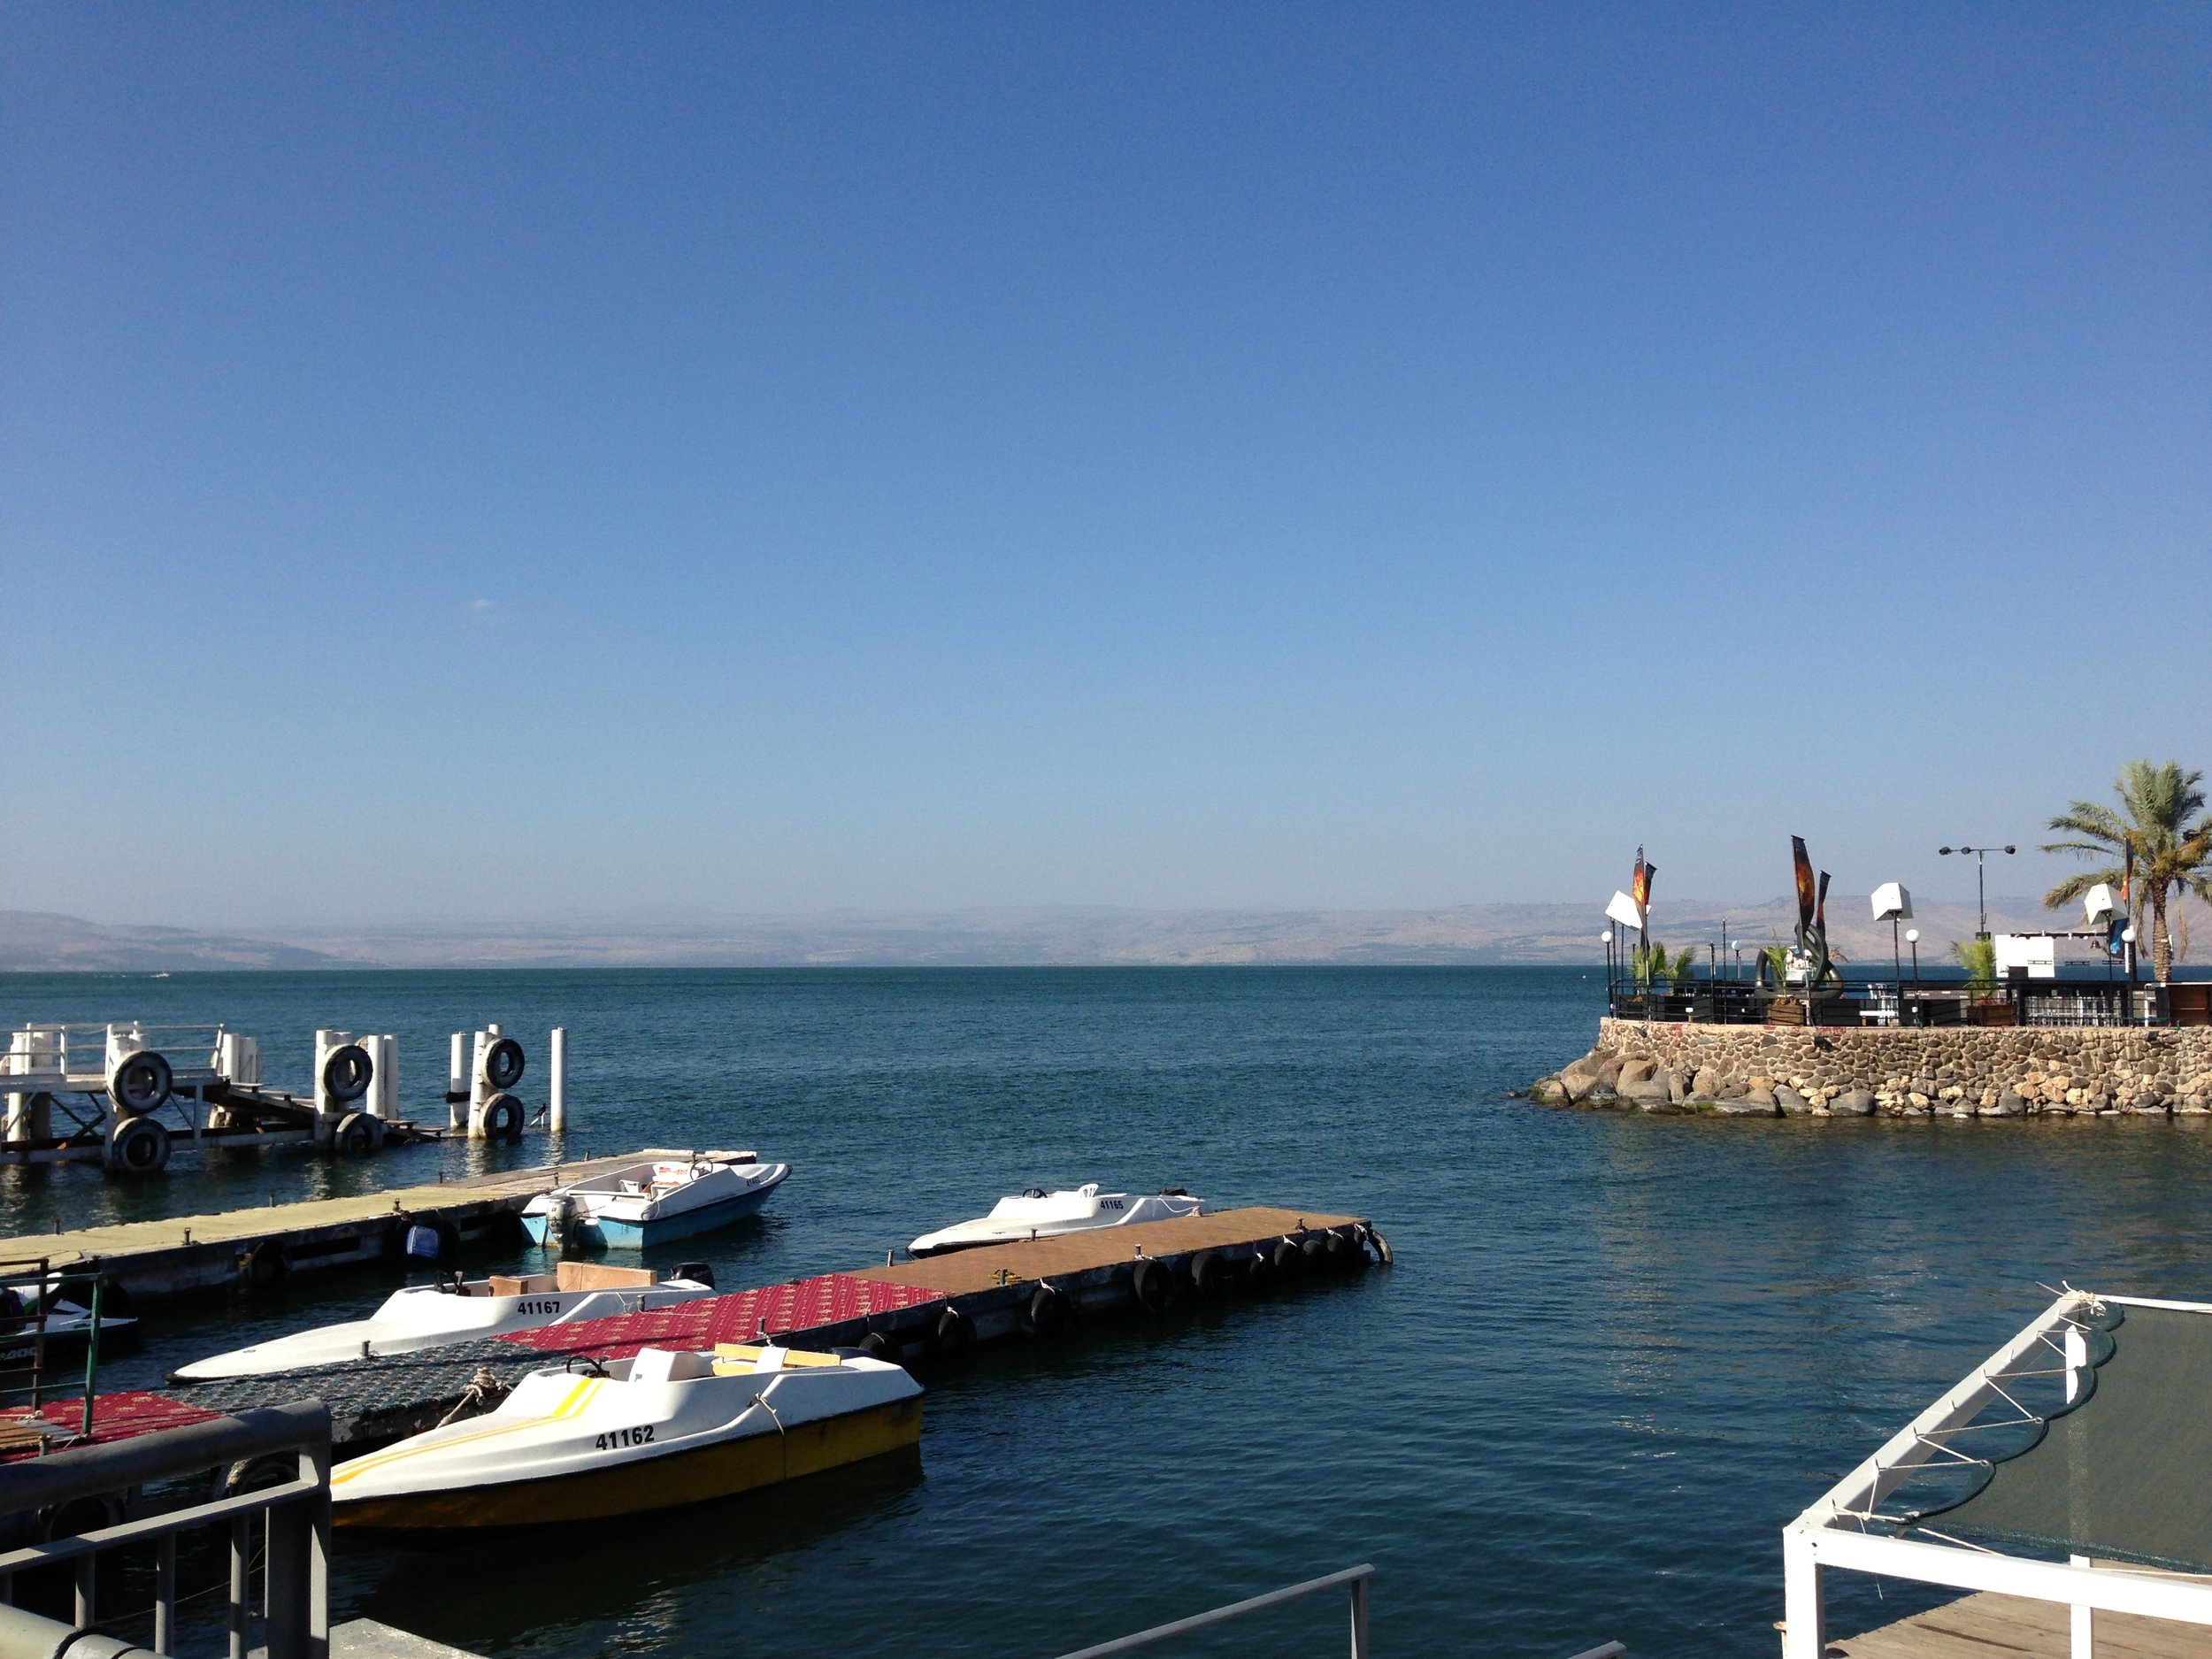 The Sea of Galilee, 2013